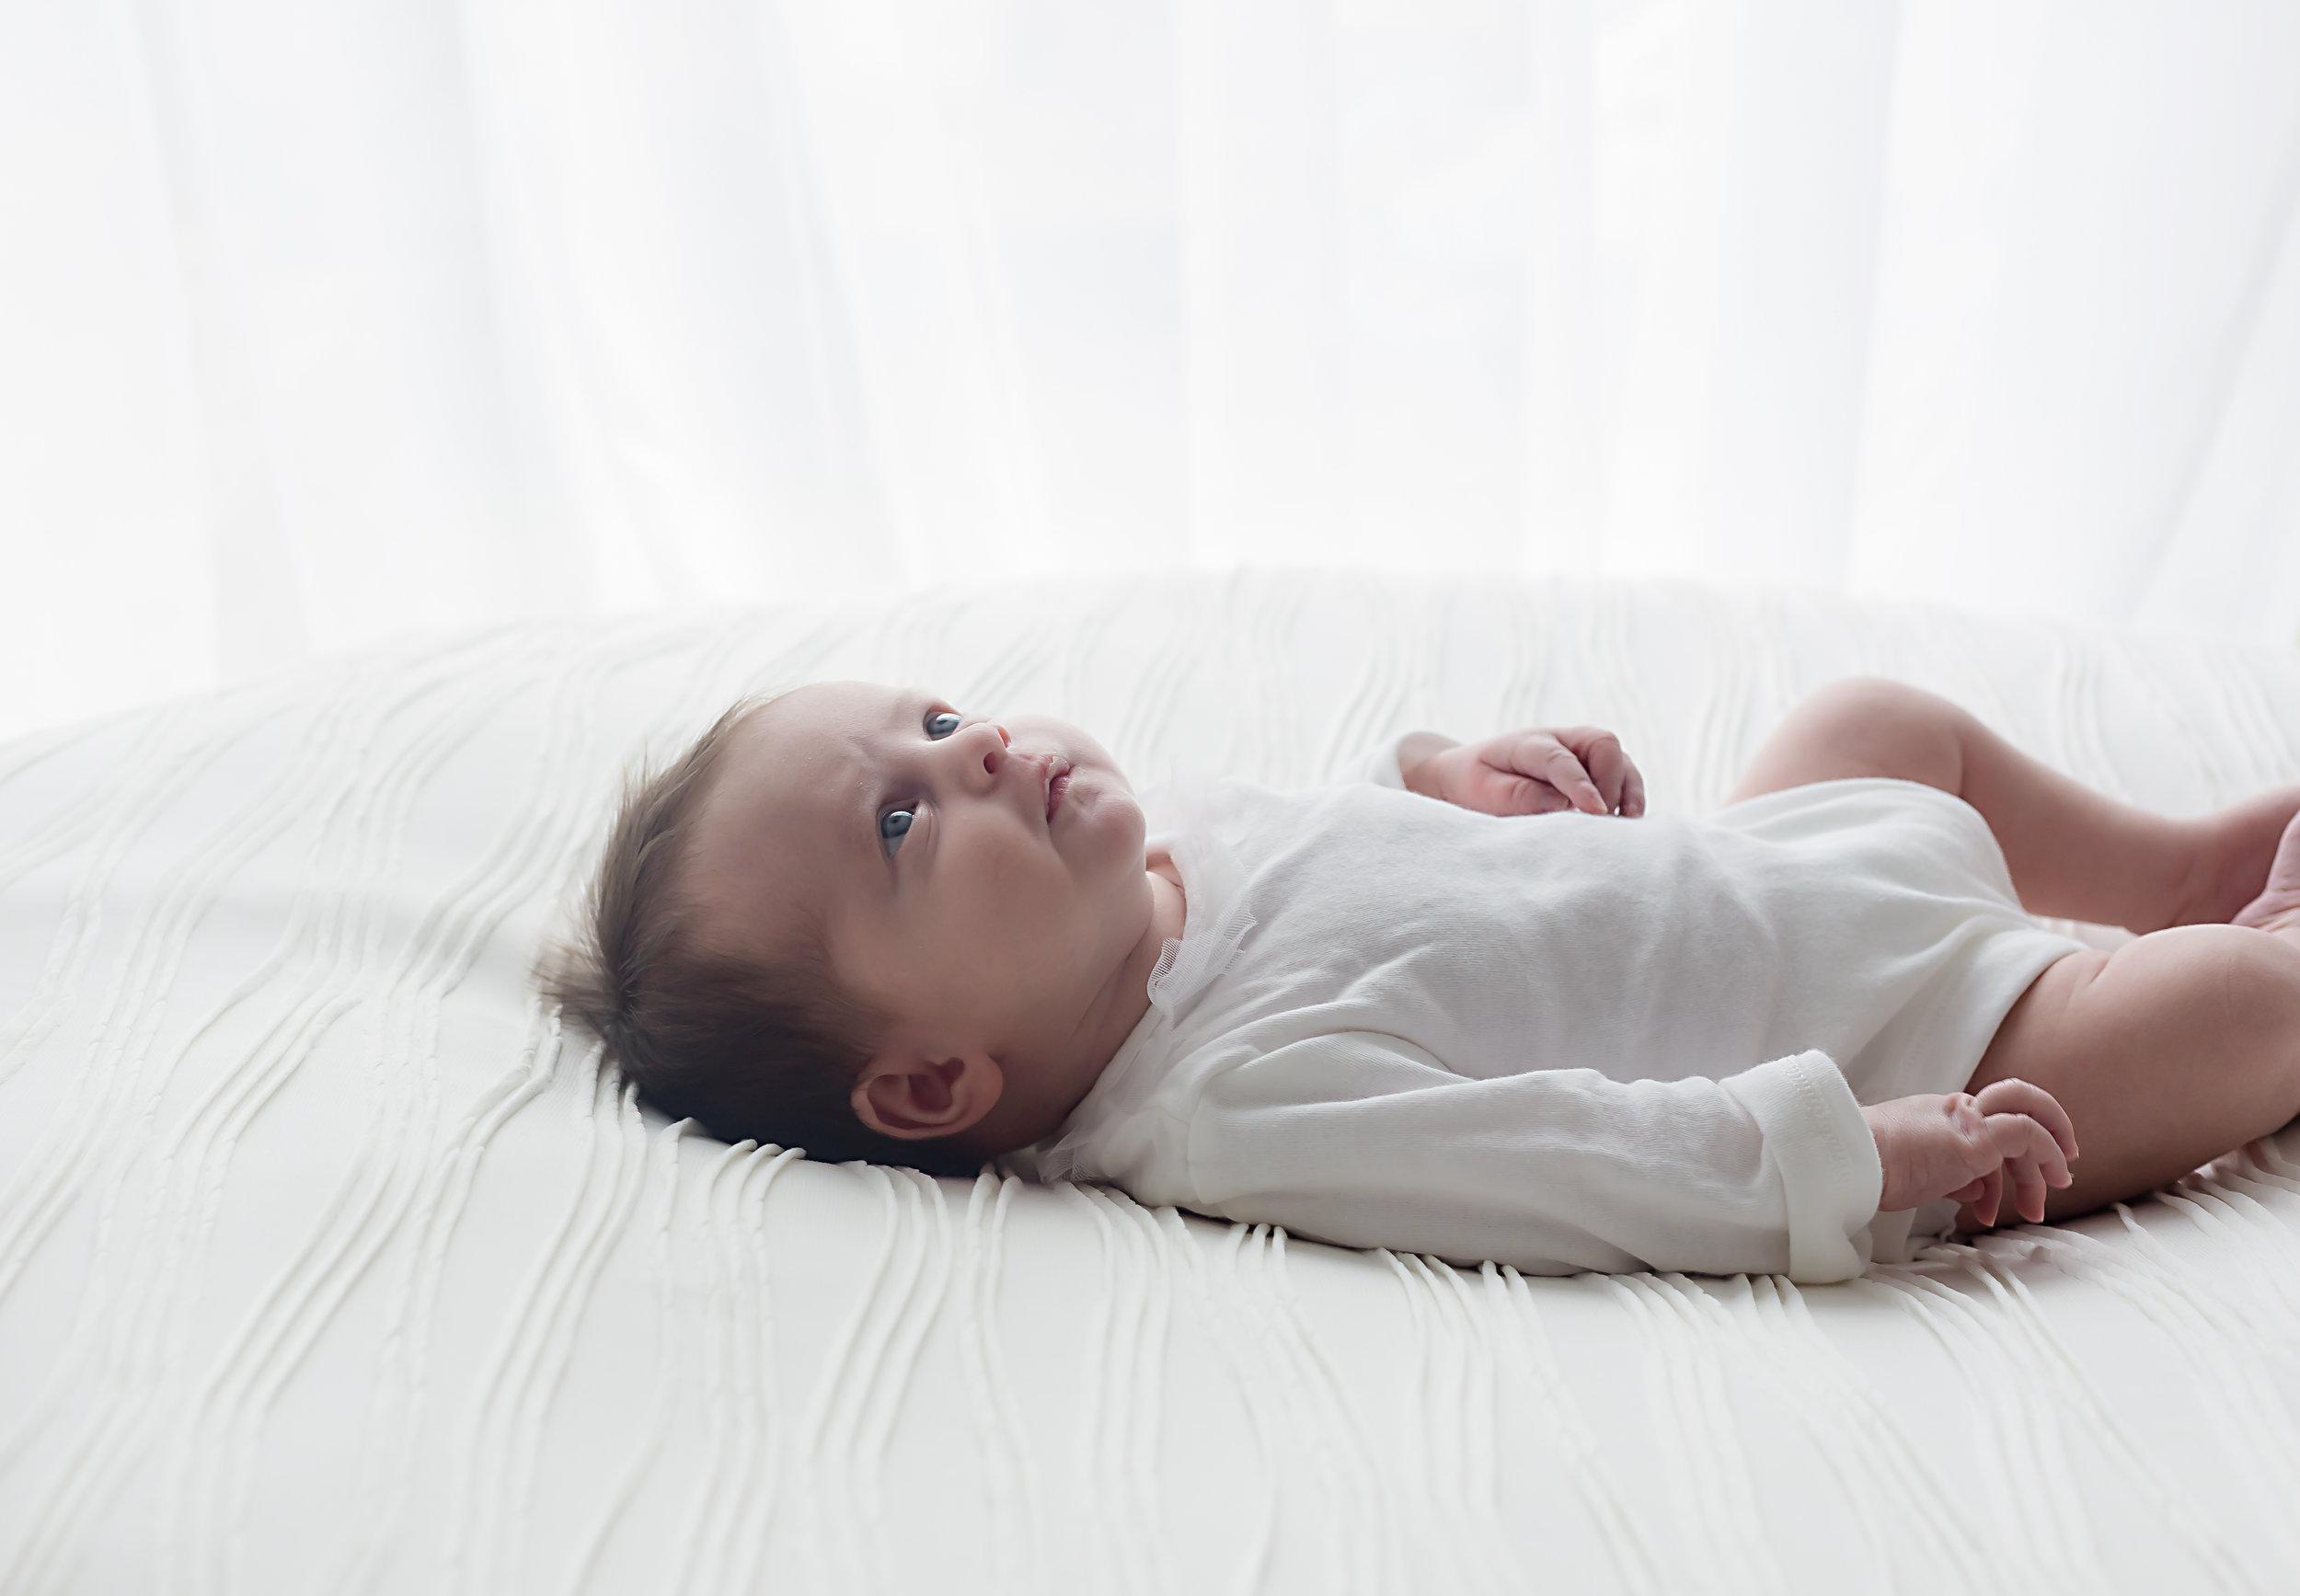 Danirosephotography.newbornphotographeraberdeen.minisession.2.jpg